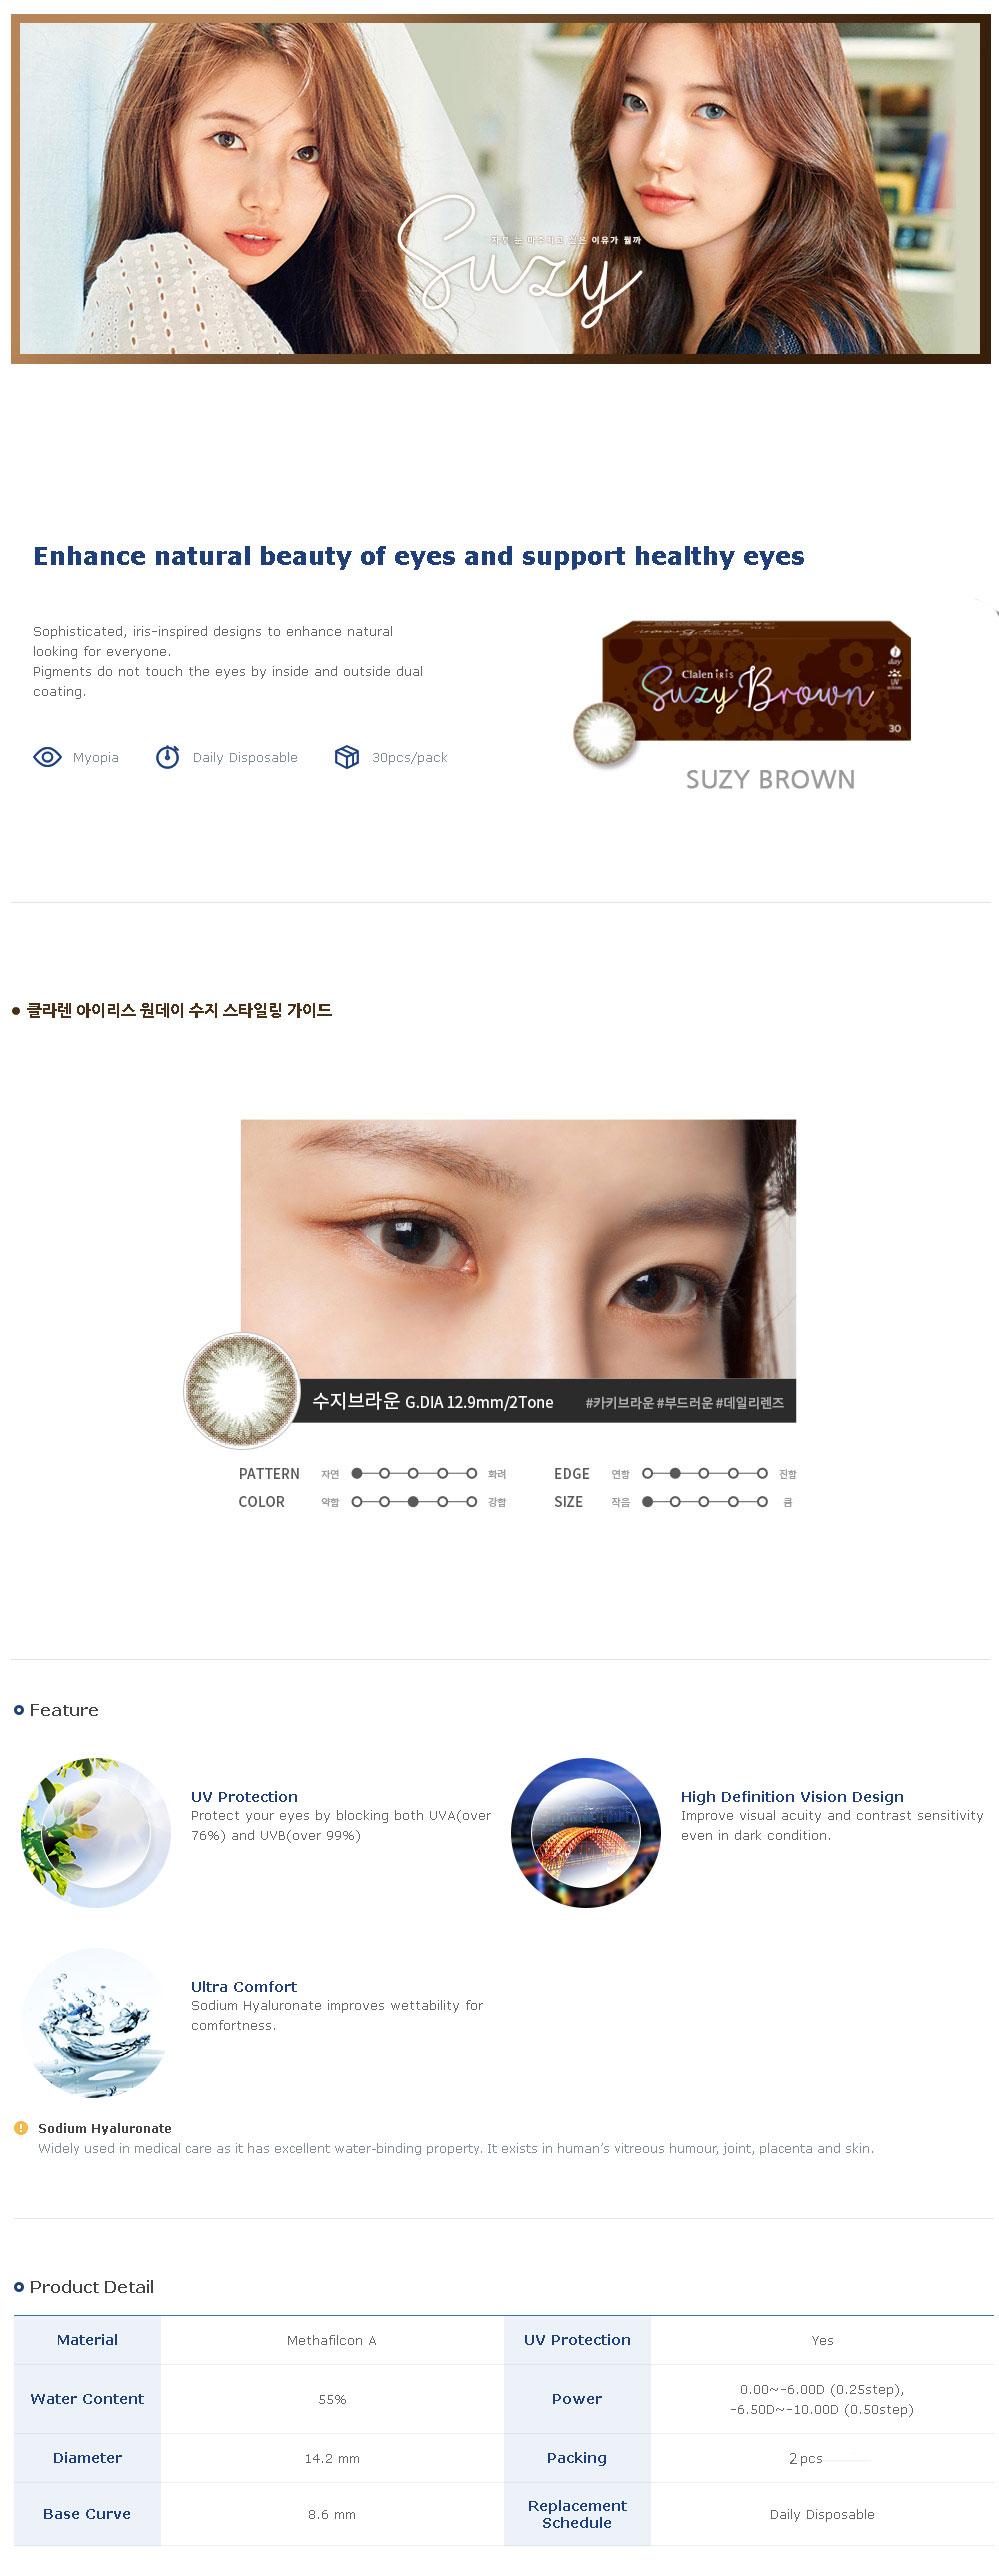 suzy-brown-test2pcs.jpg